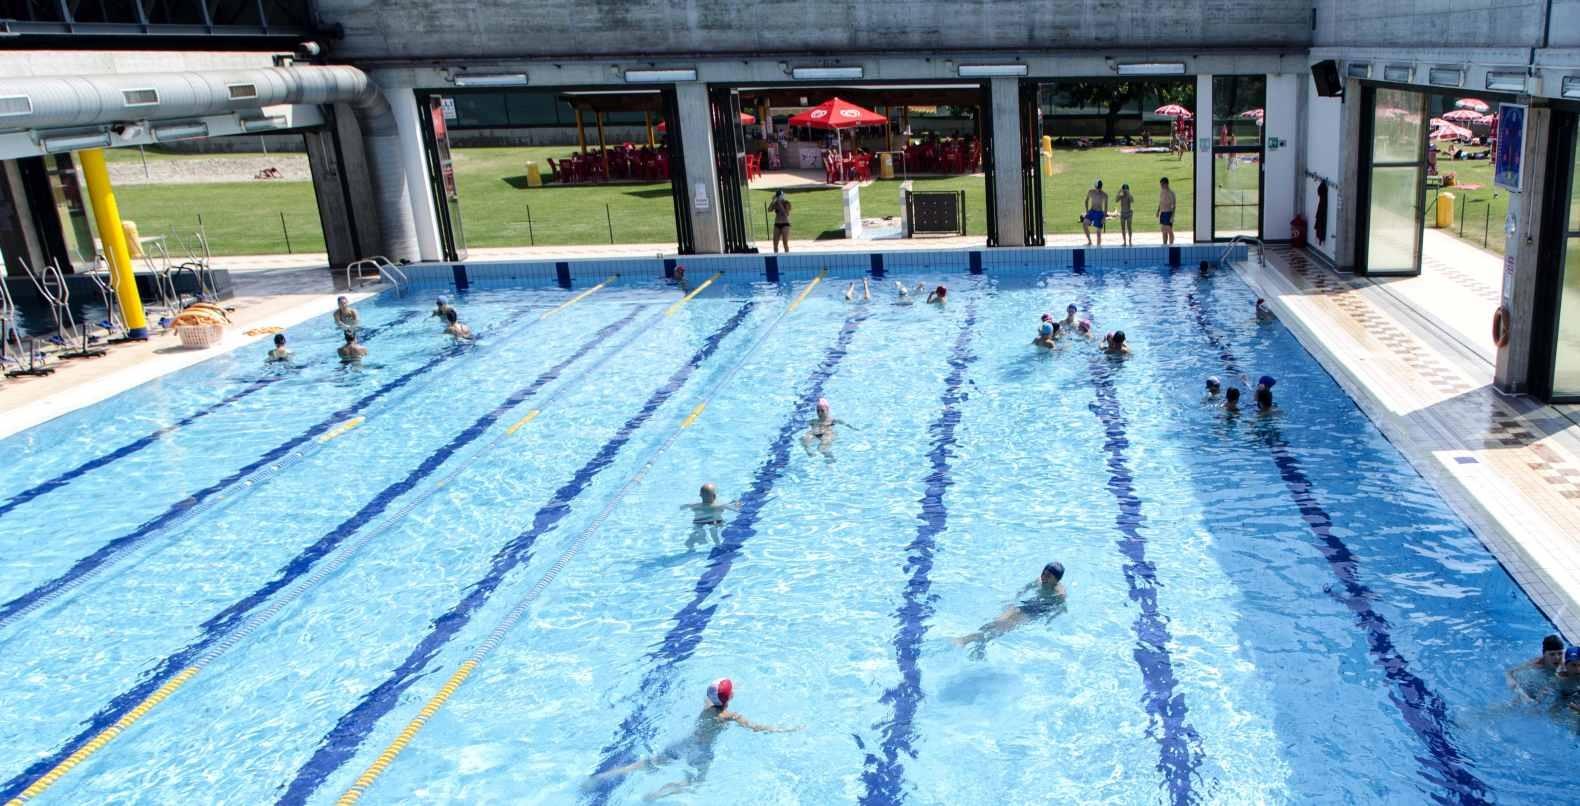 Incontri piscina nei vostri anni trenta